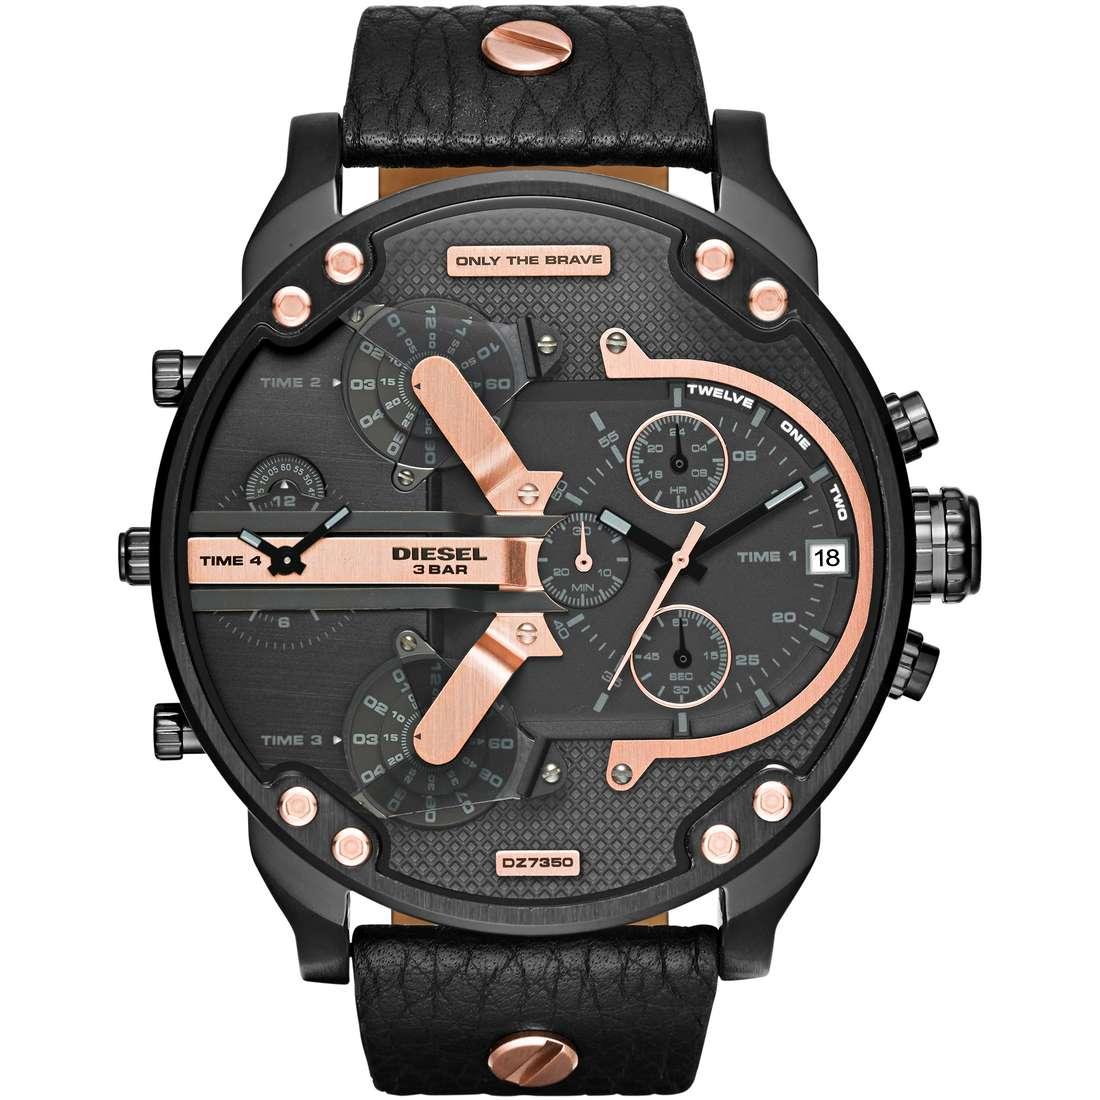 orologio multifunzione uomo Diesel Mr. Daddy 2.0 DZ7350